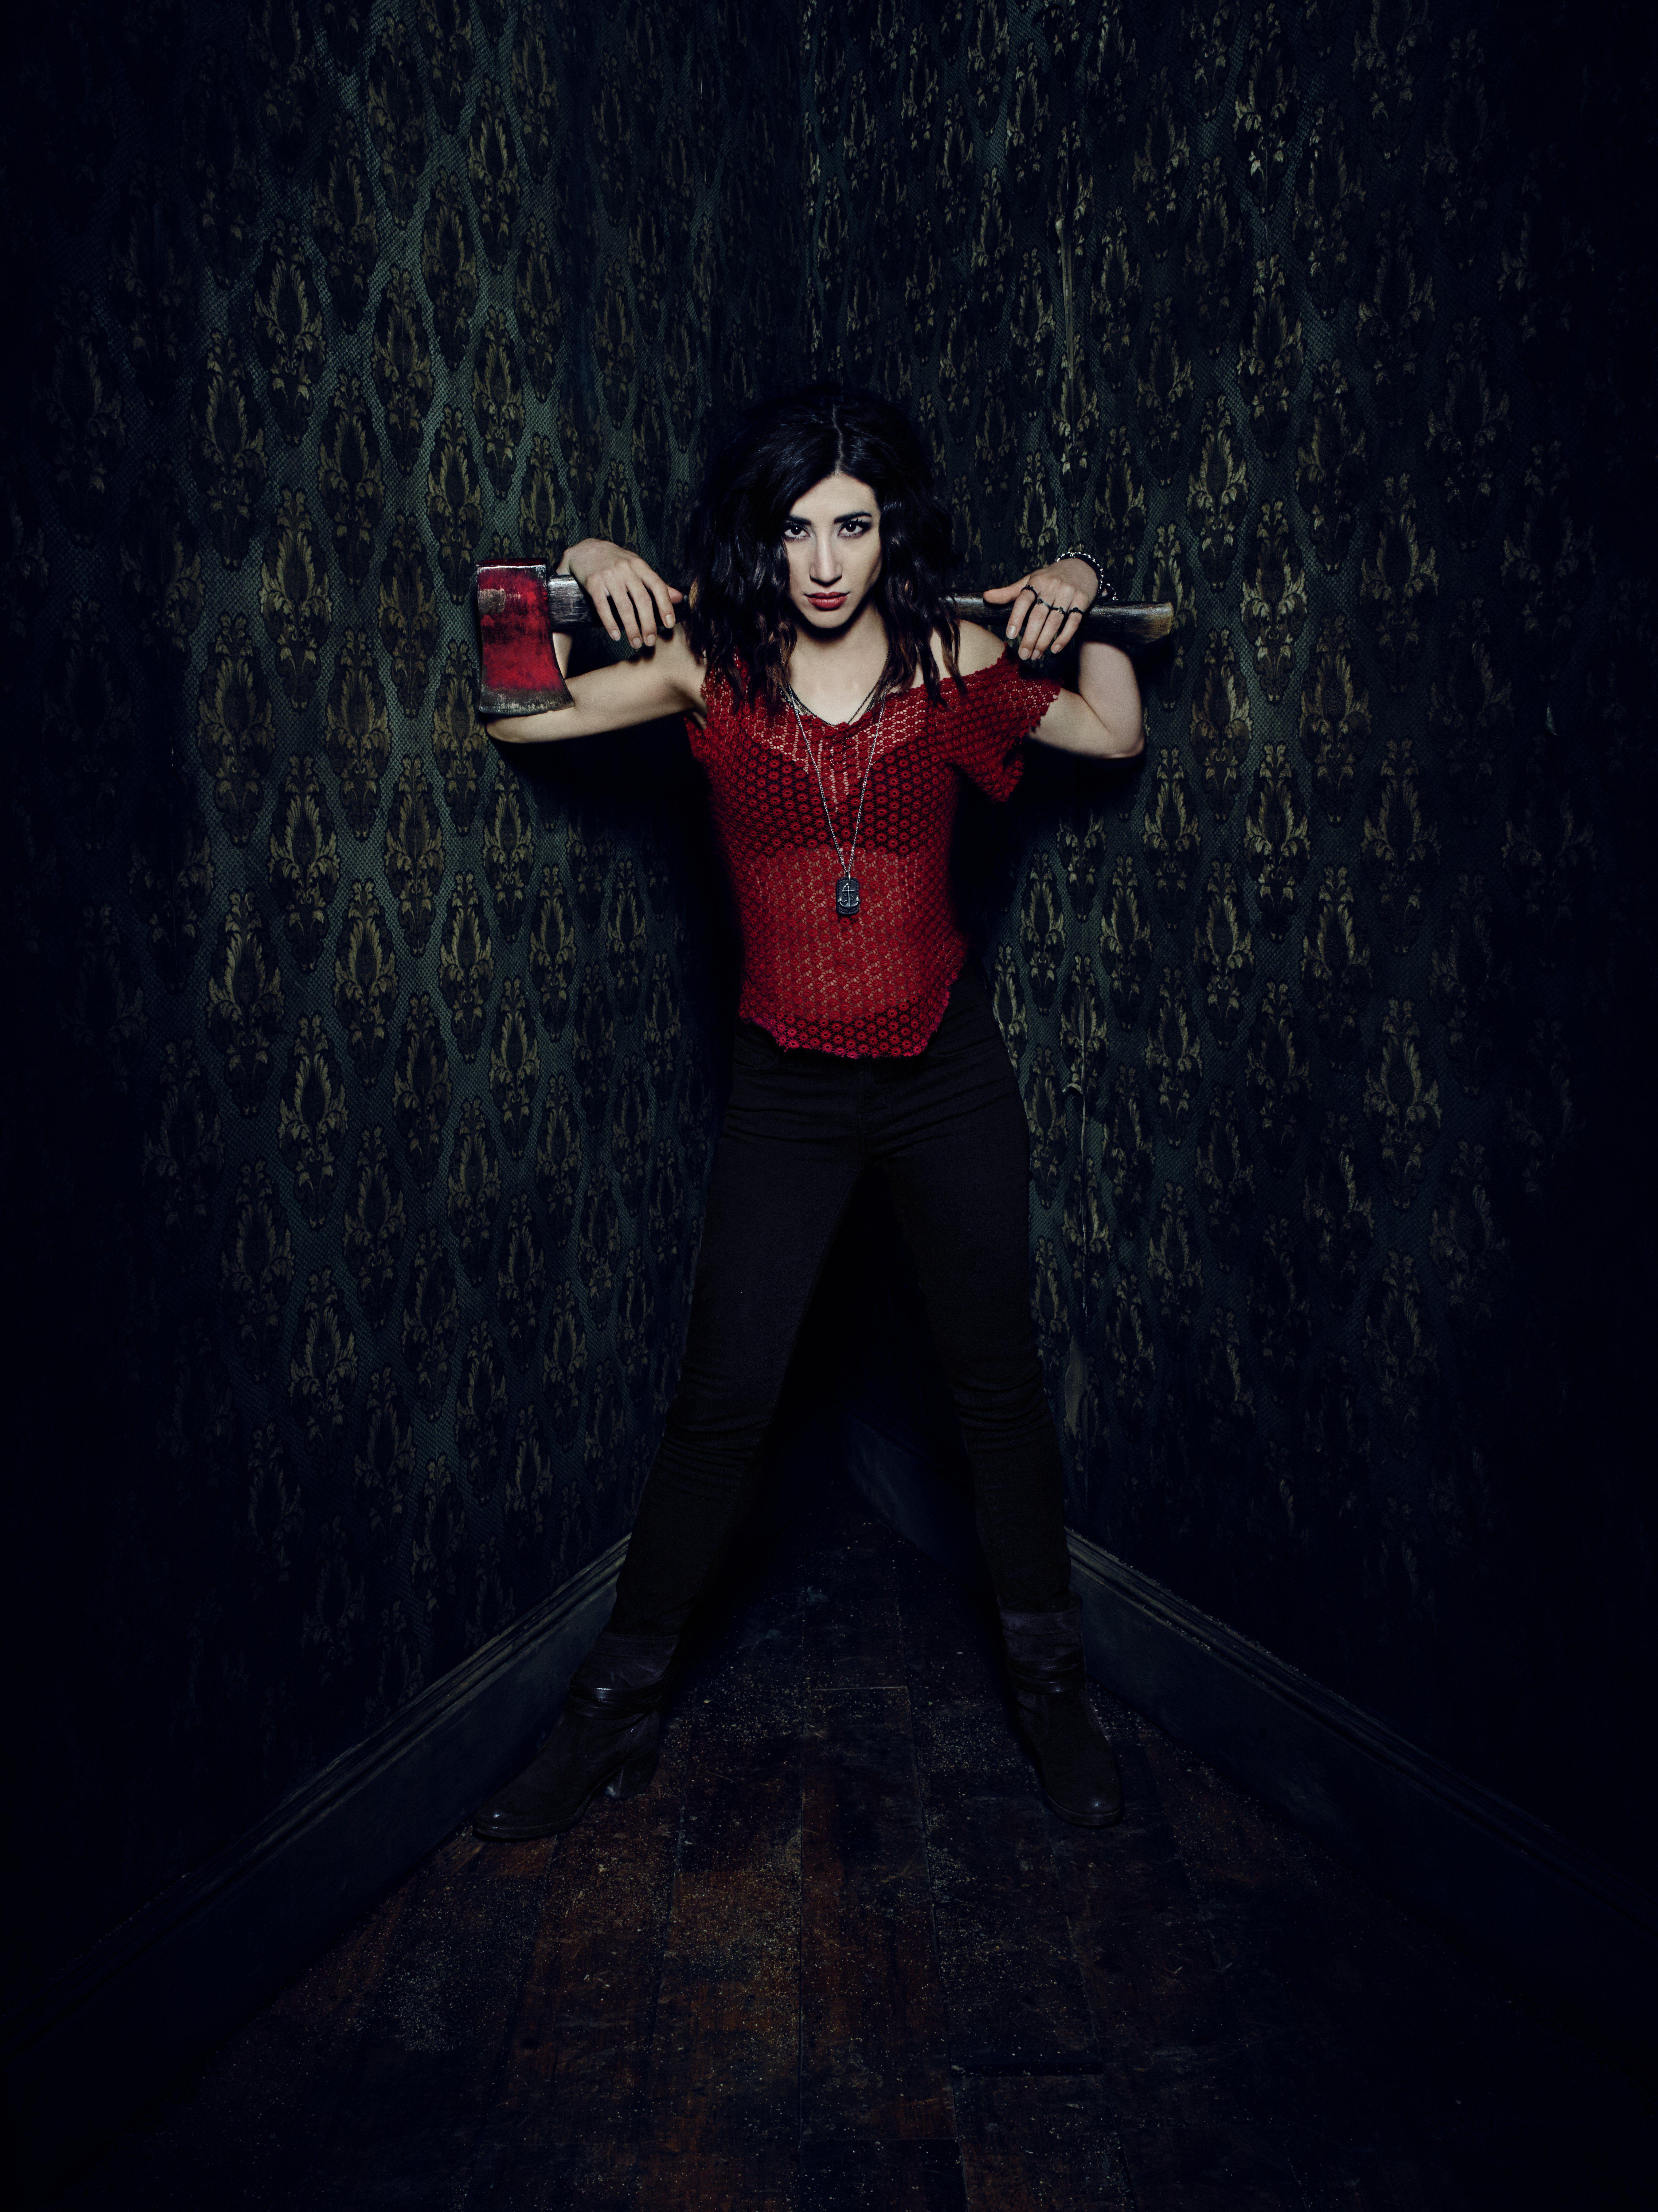 Evil Dead S1 Dana Delorenzo As Kelly Maxwell 920349 Hd